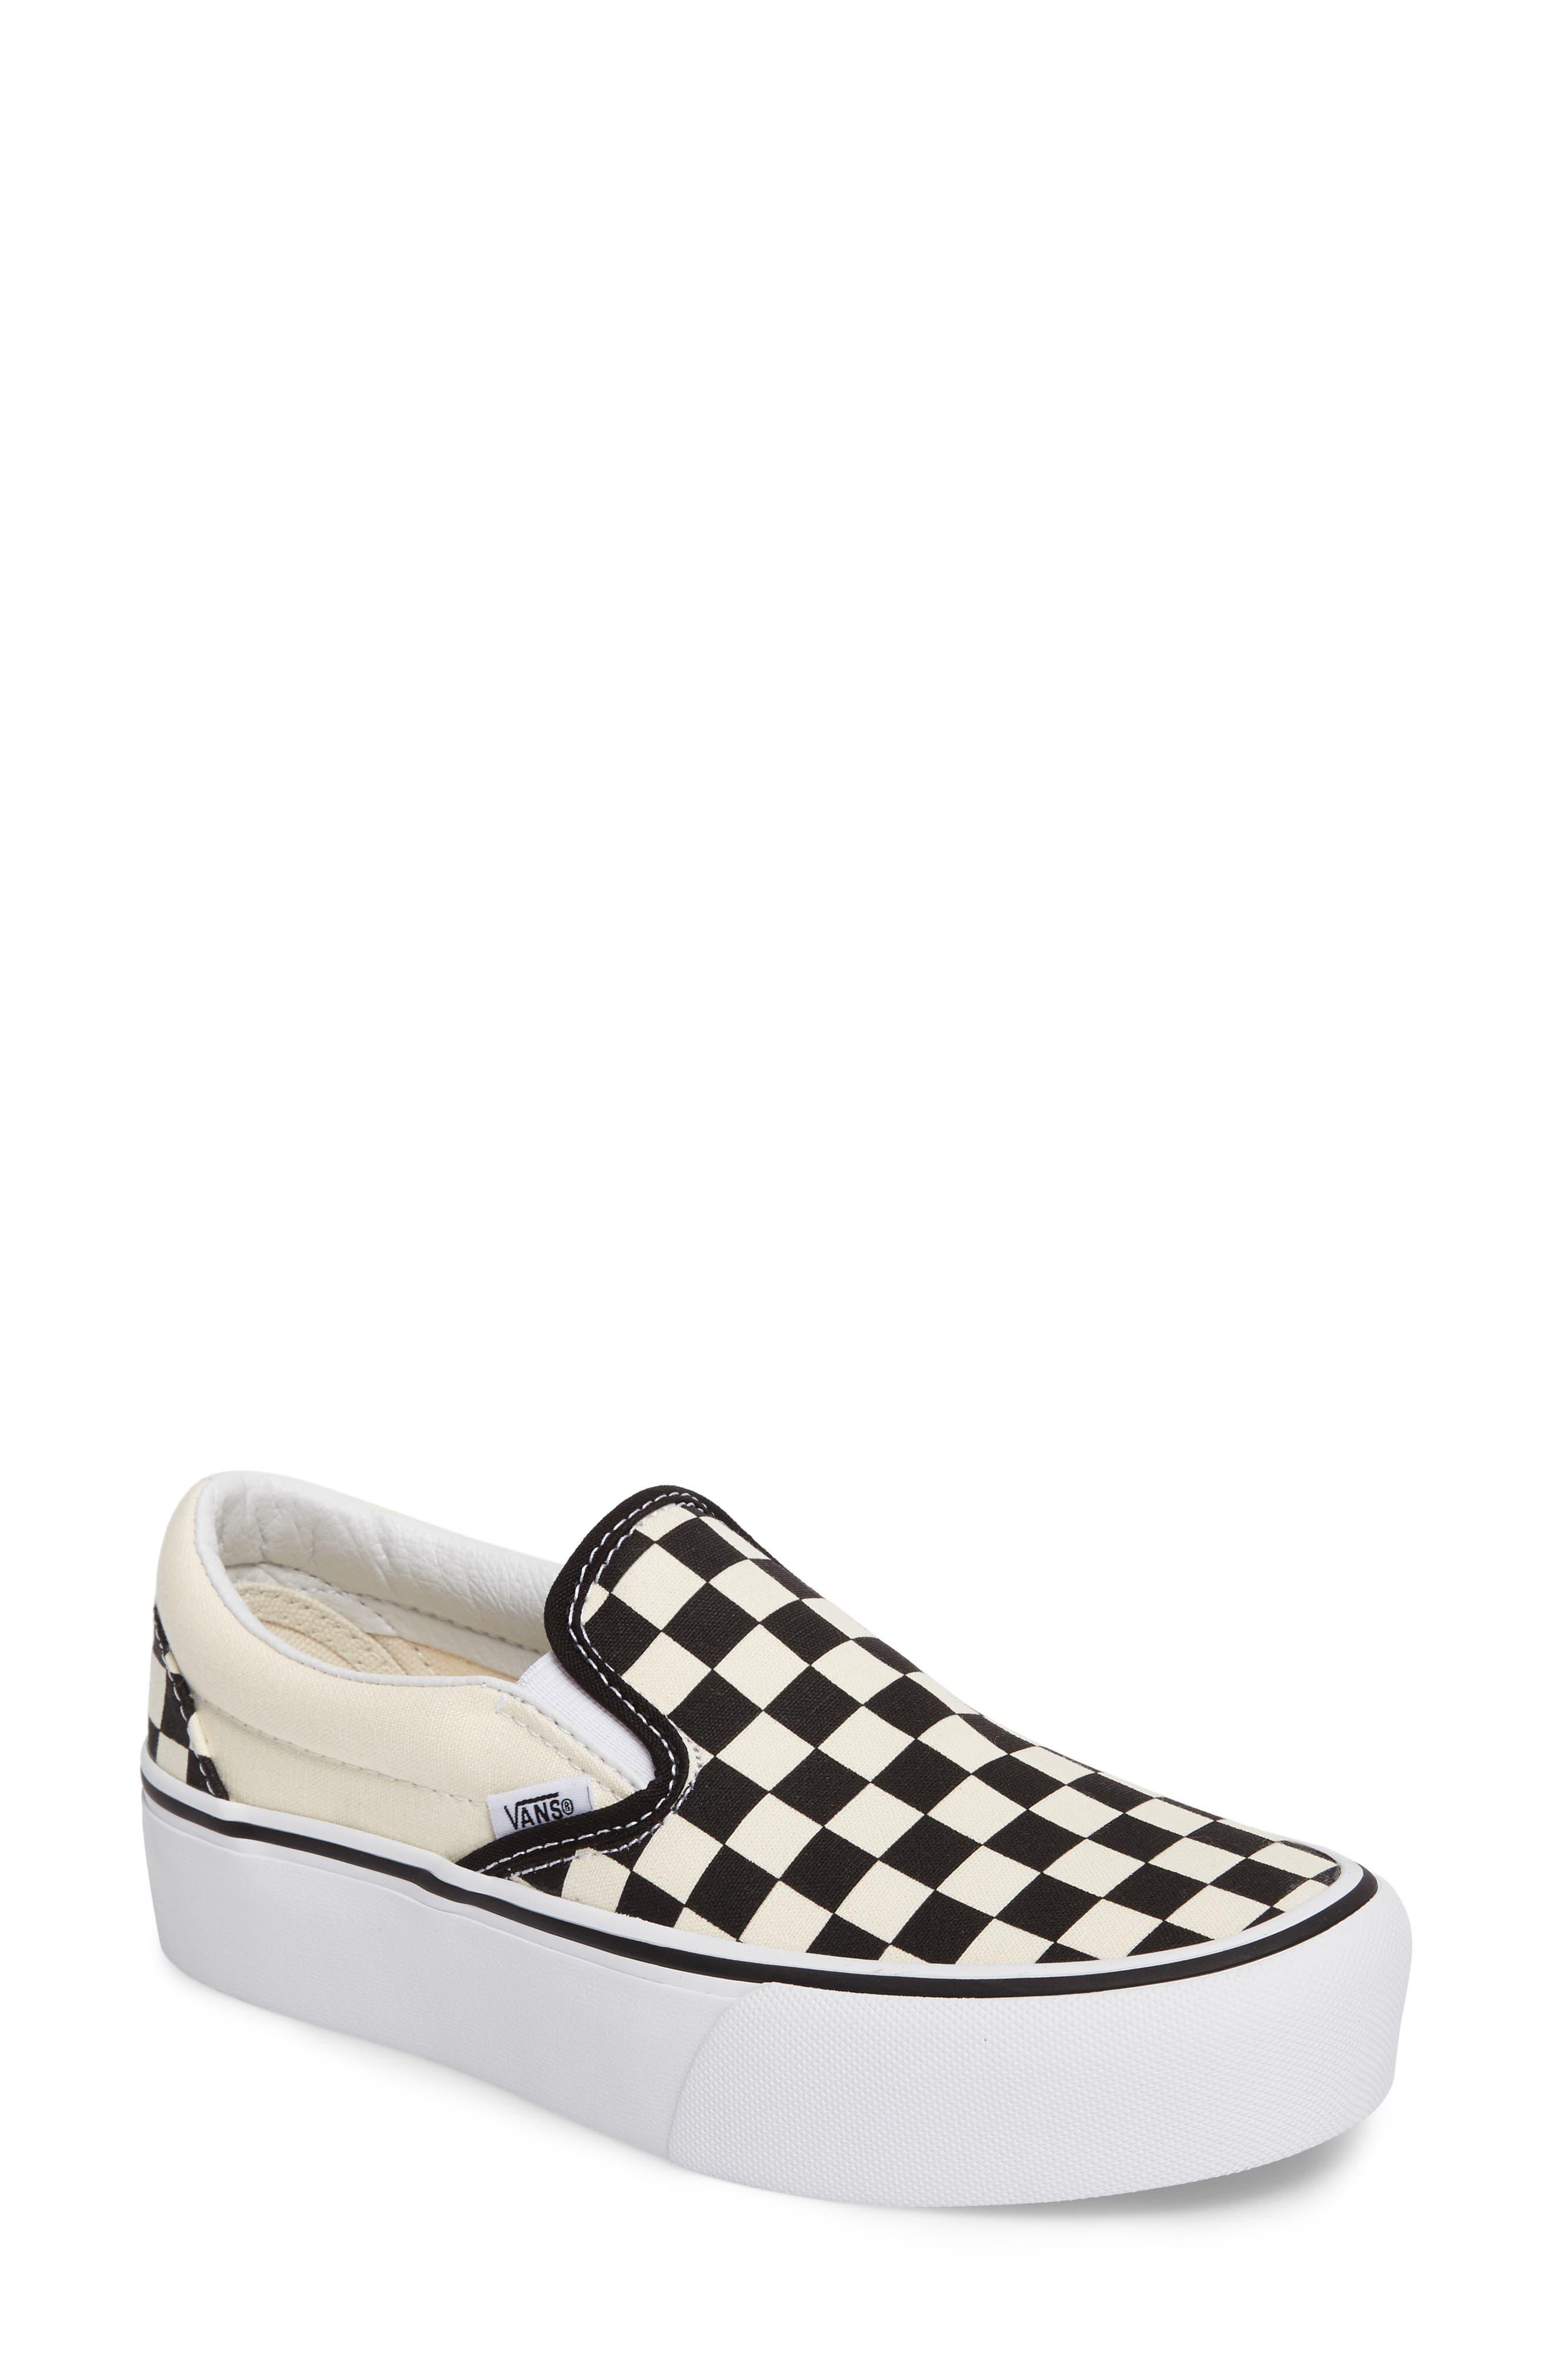 Vans Platform Slip-On Sneaker, Black